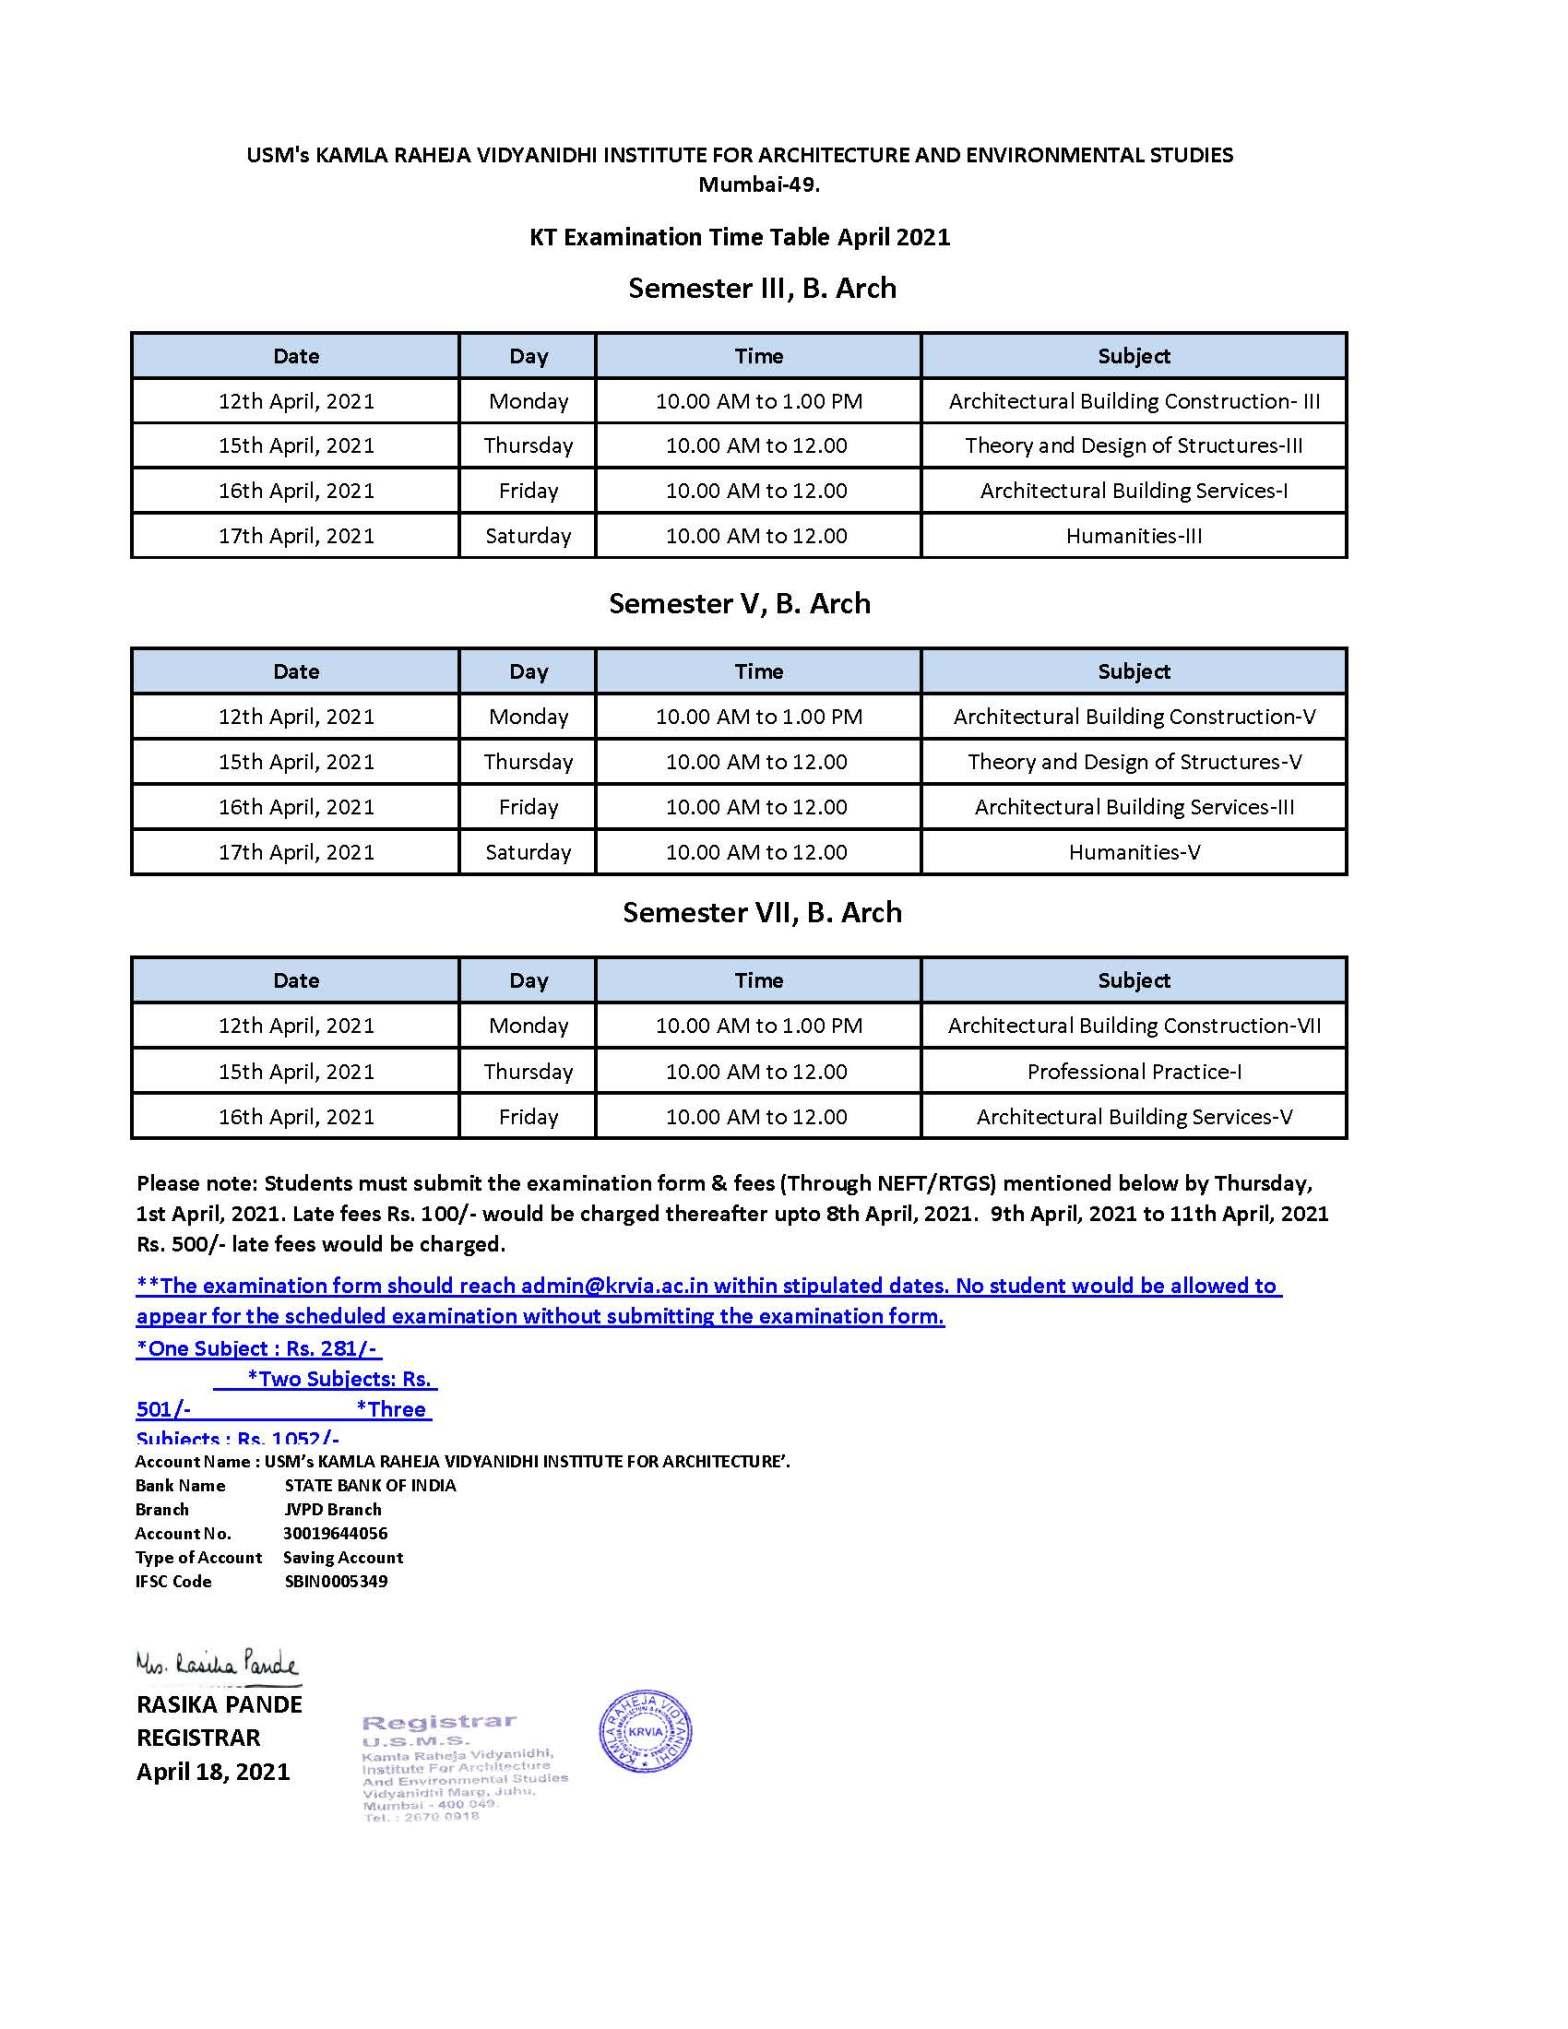 Usm Academic Calendar Fall 2022.Usm S Krvia Page 2 Kamla Raheja Vidyanidhi Institute For Architecture Environmental Studies